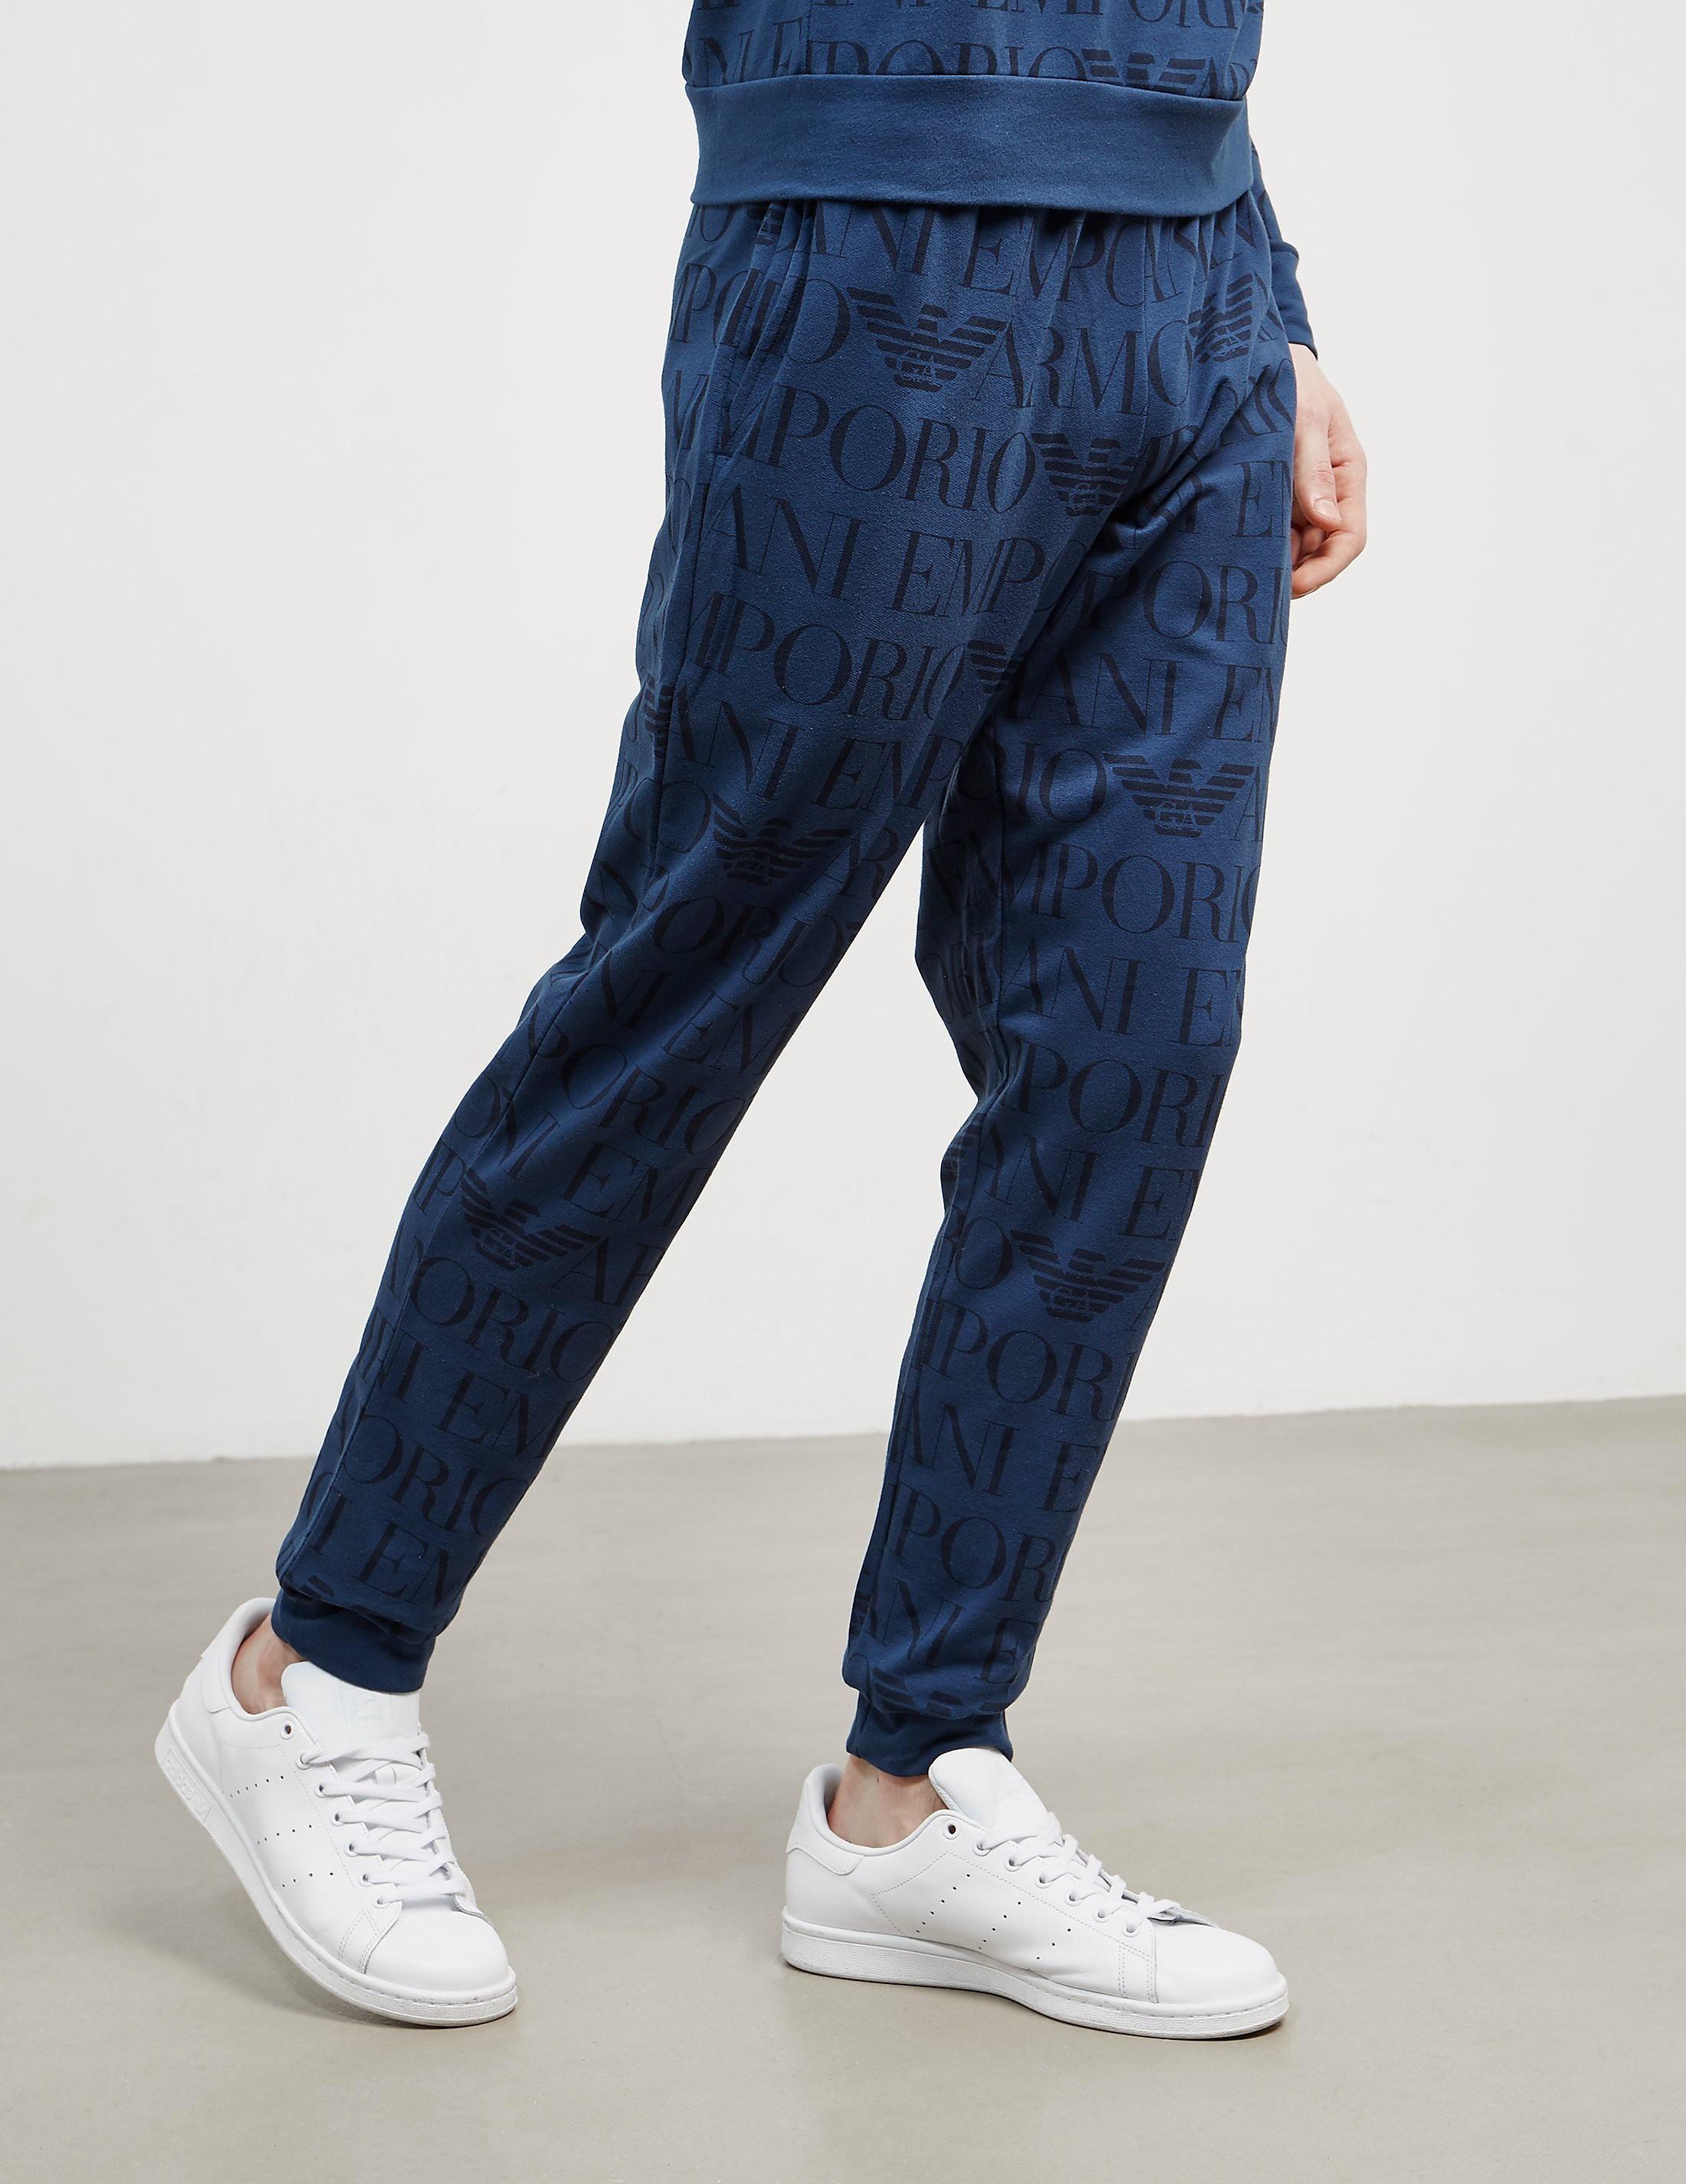 Emporio Armani All Over Print Track Pants